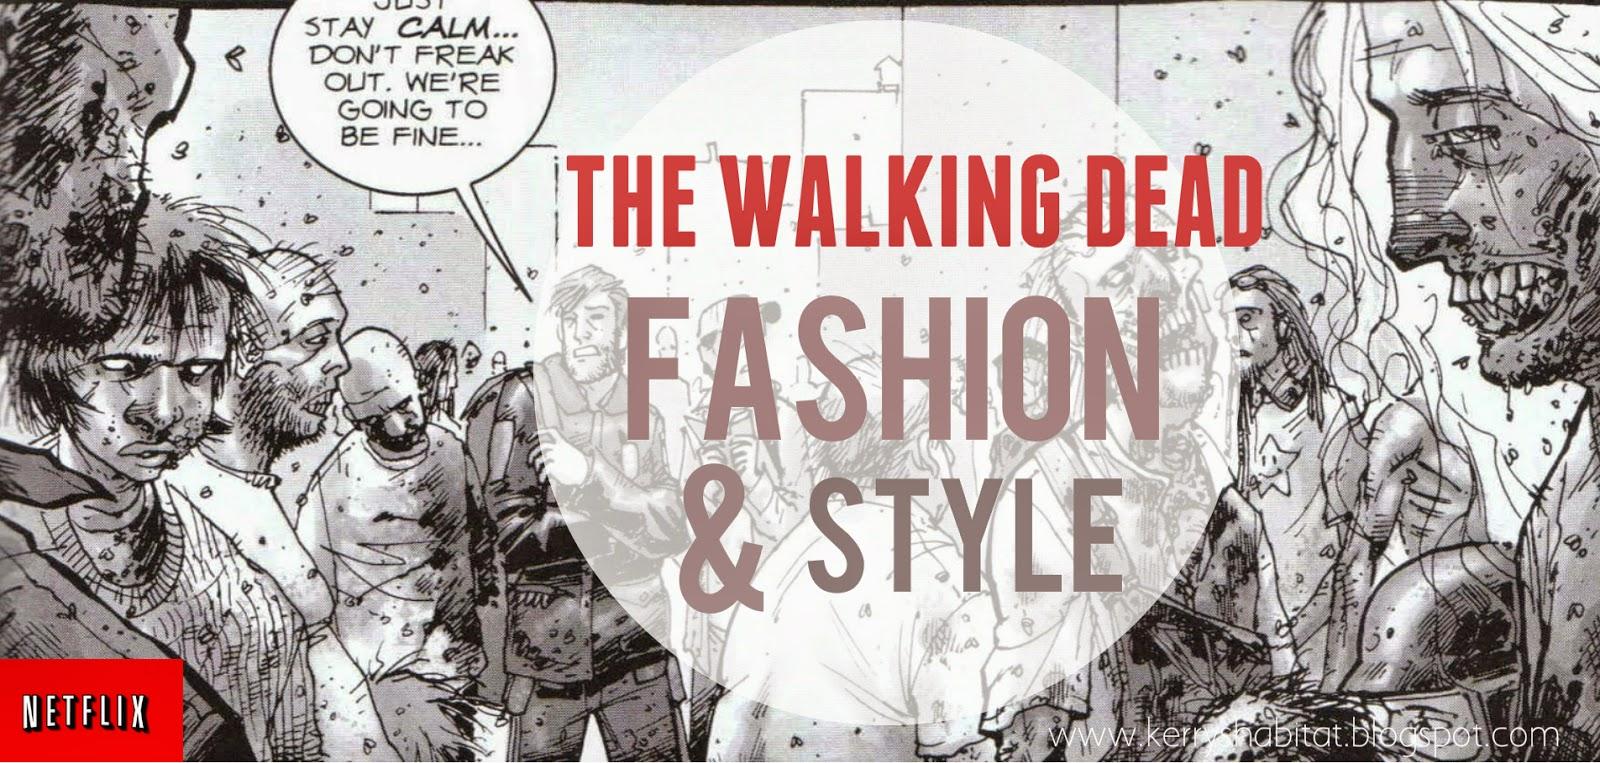 http://kerryshabitat.blogspot.co.uk/2014/05/walking-dead-fashion-dead-serious.html